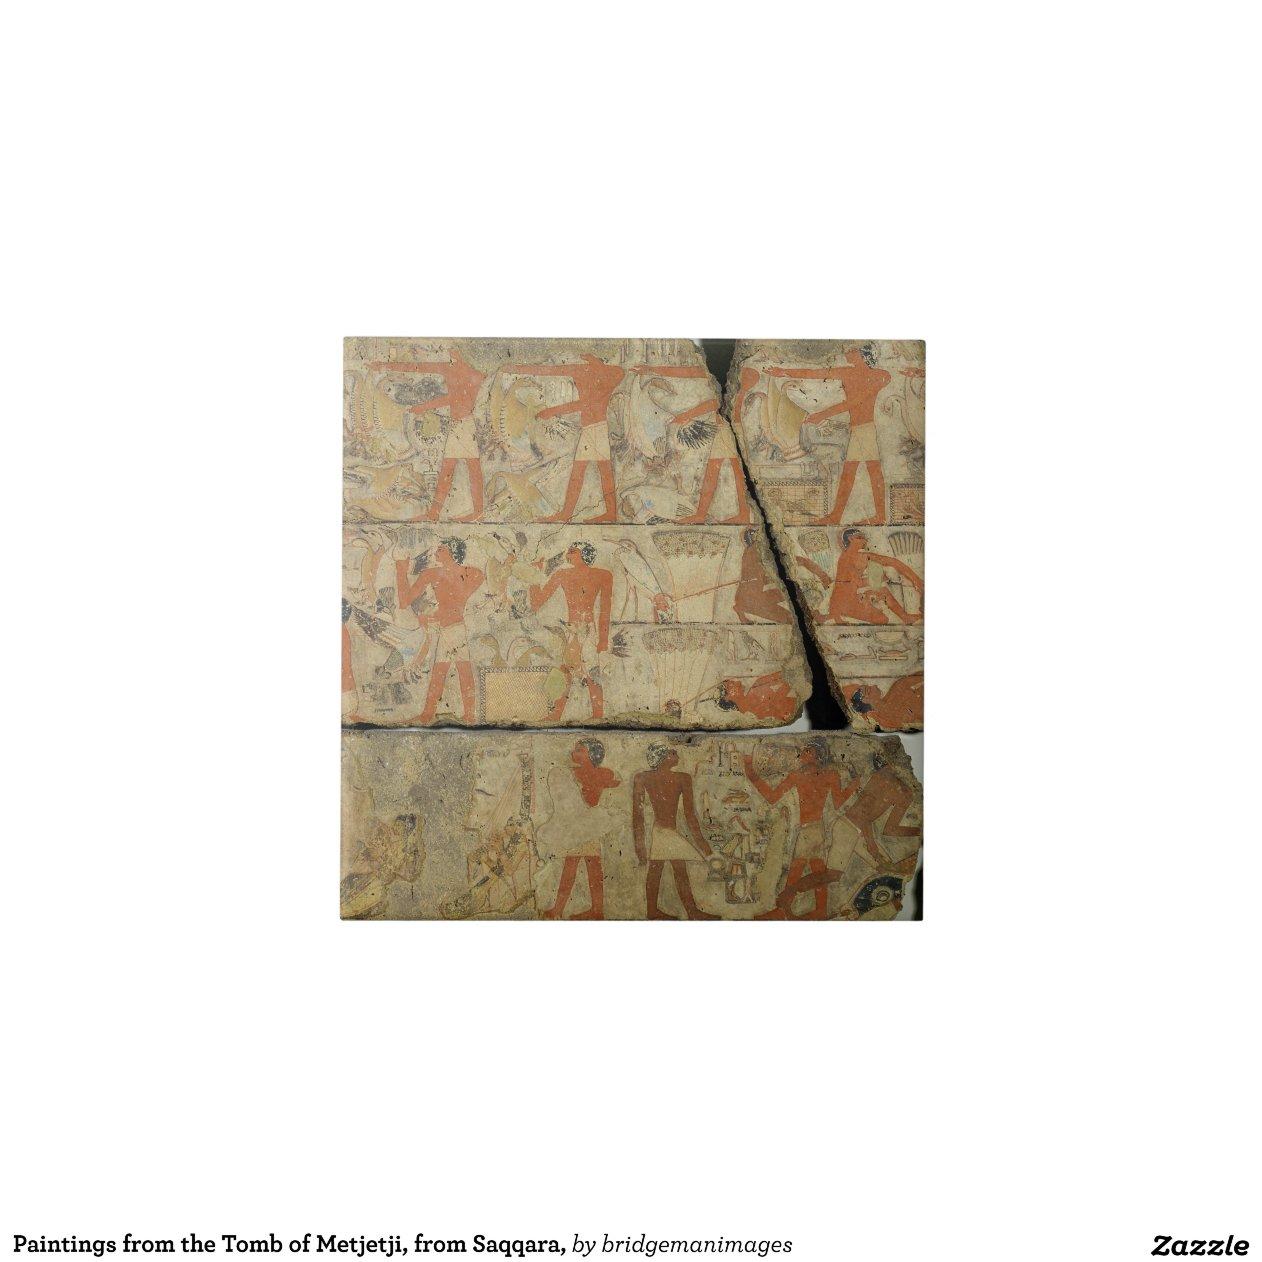 Pinturas de la tumba de metjetji de saqqara azulejos - Pintura para azulejos opiniones ...